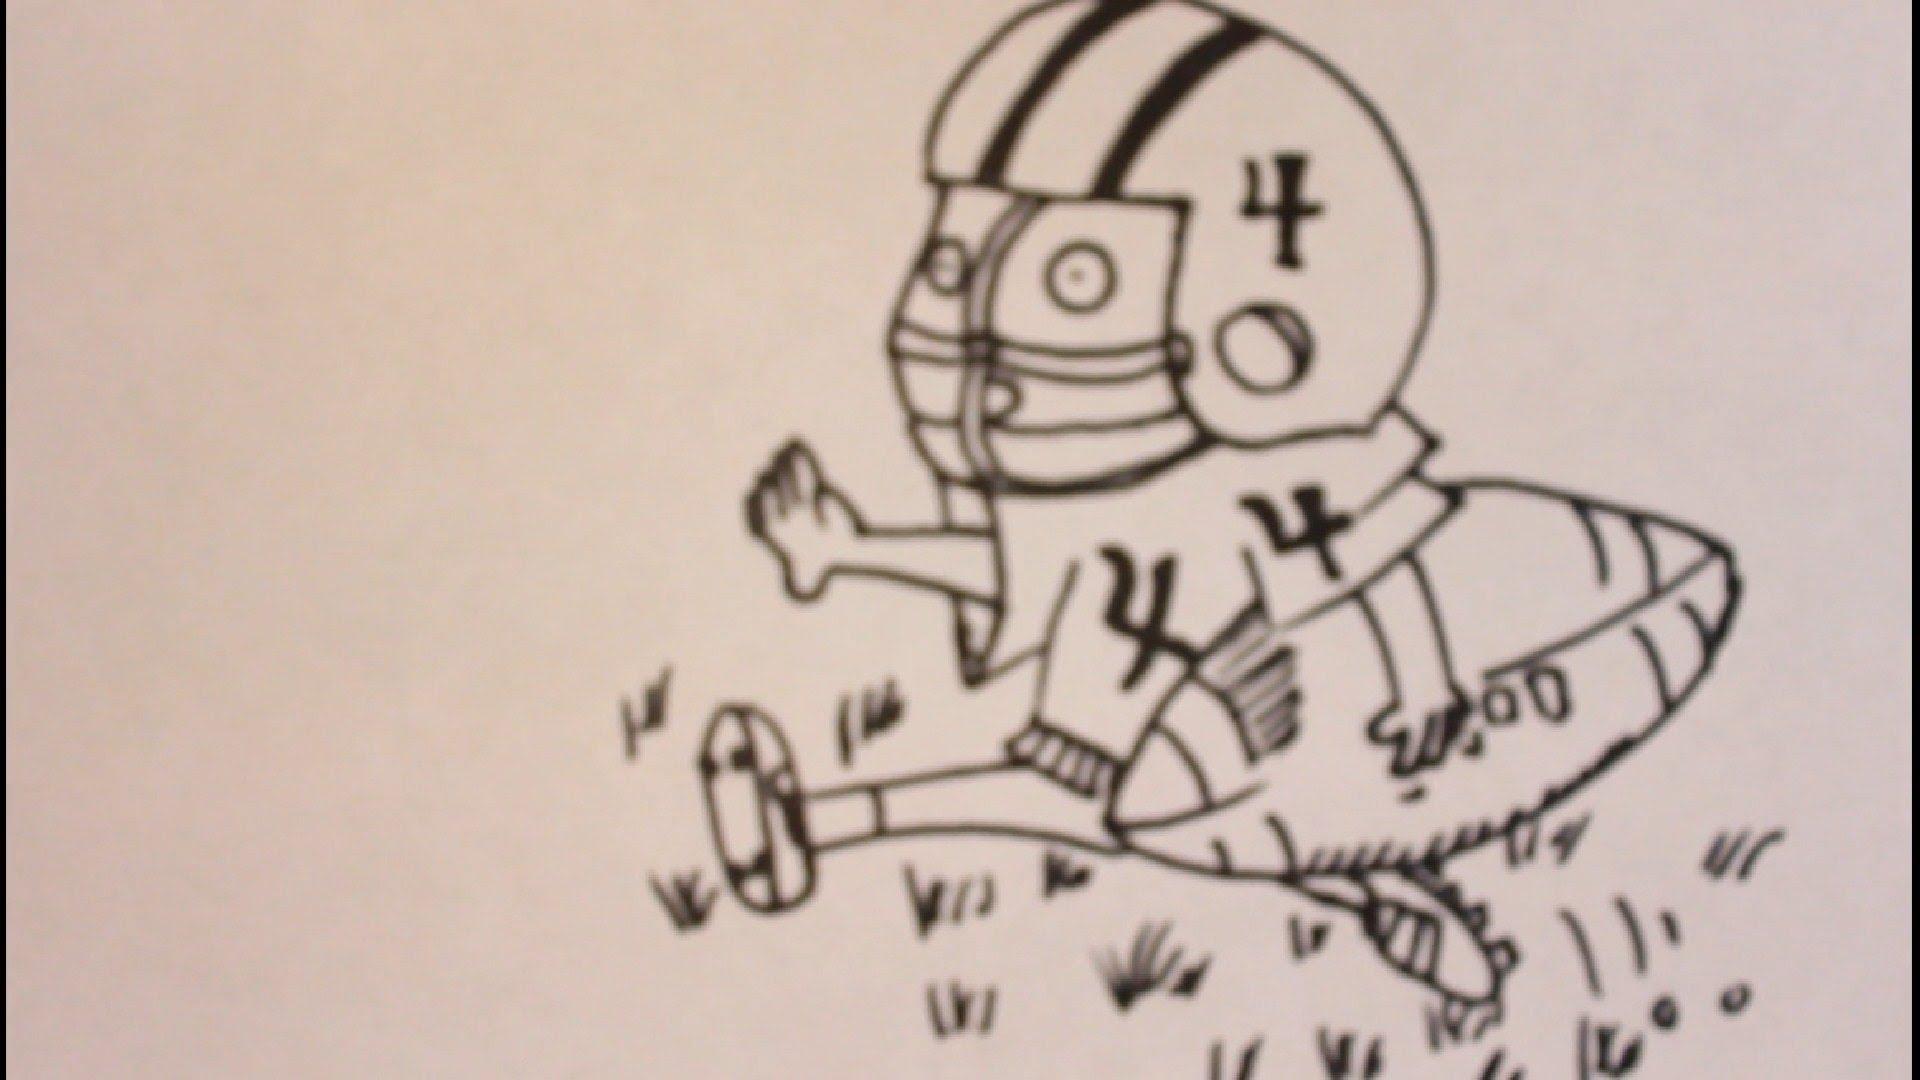 1920x1080 How To Draw Cartoon Football Players How To Draw A Cartoon